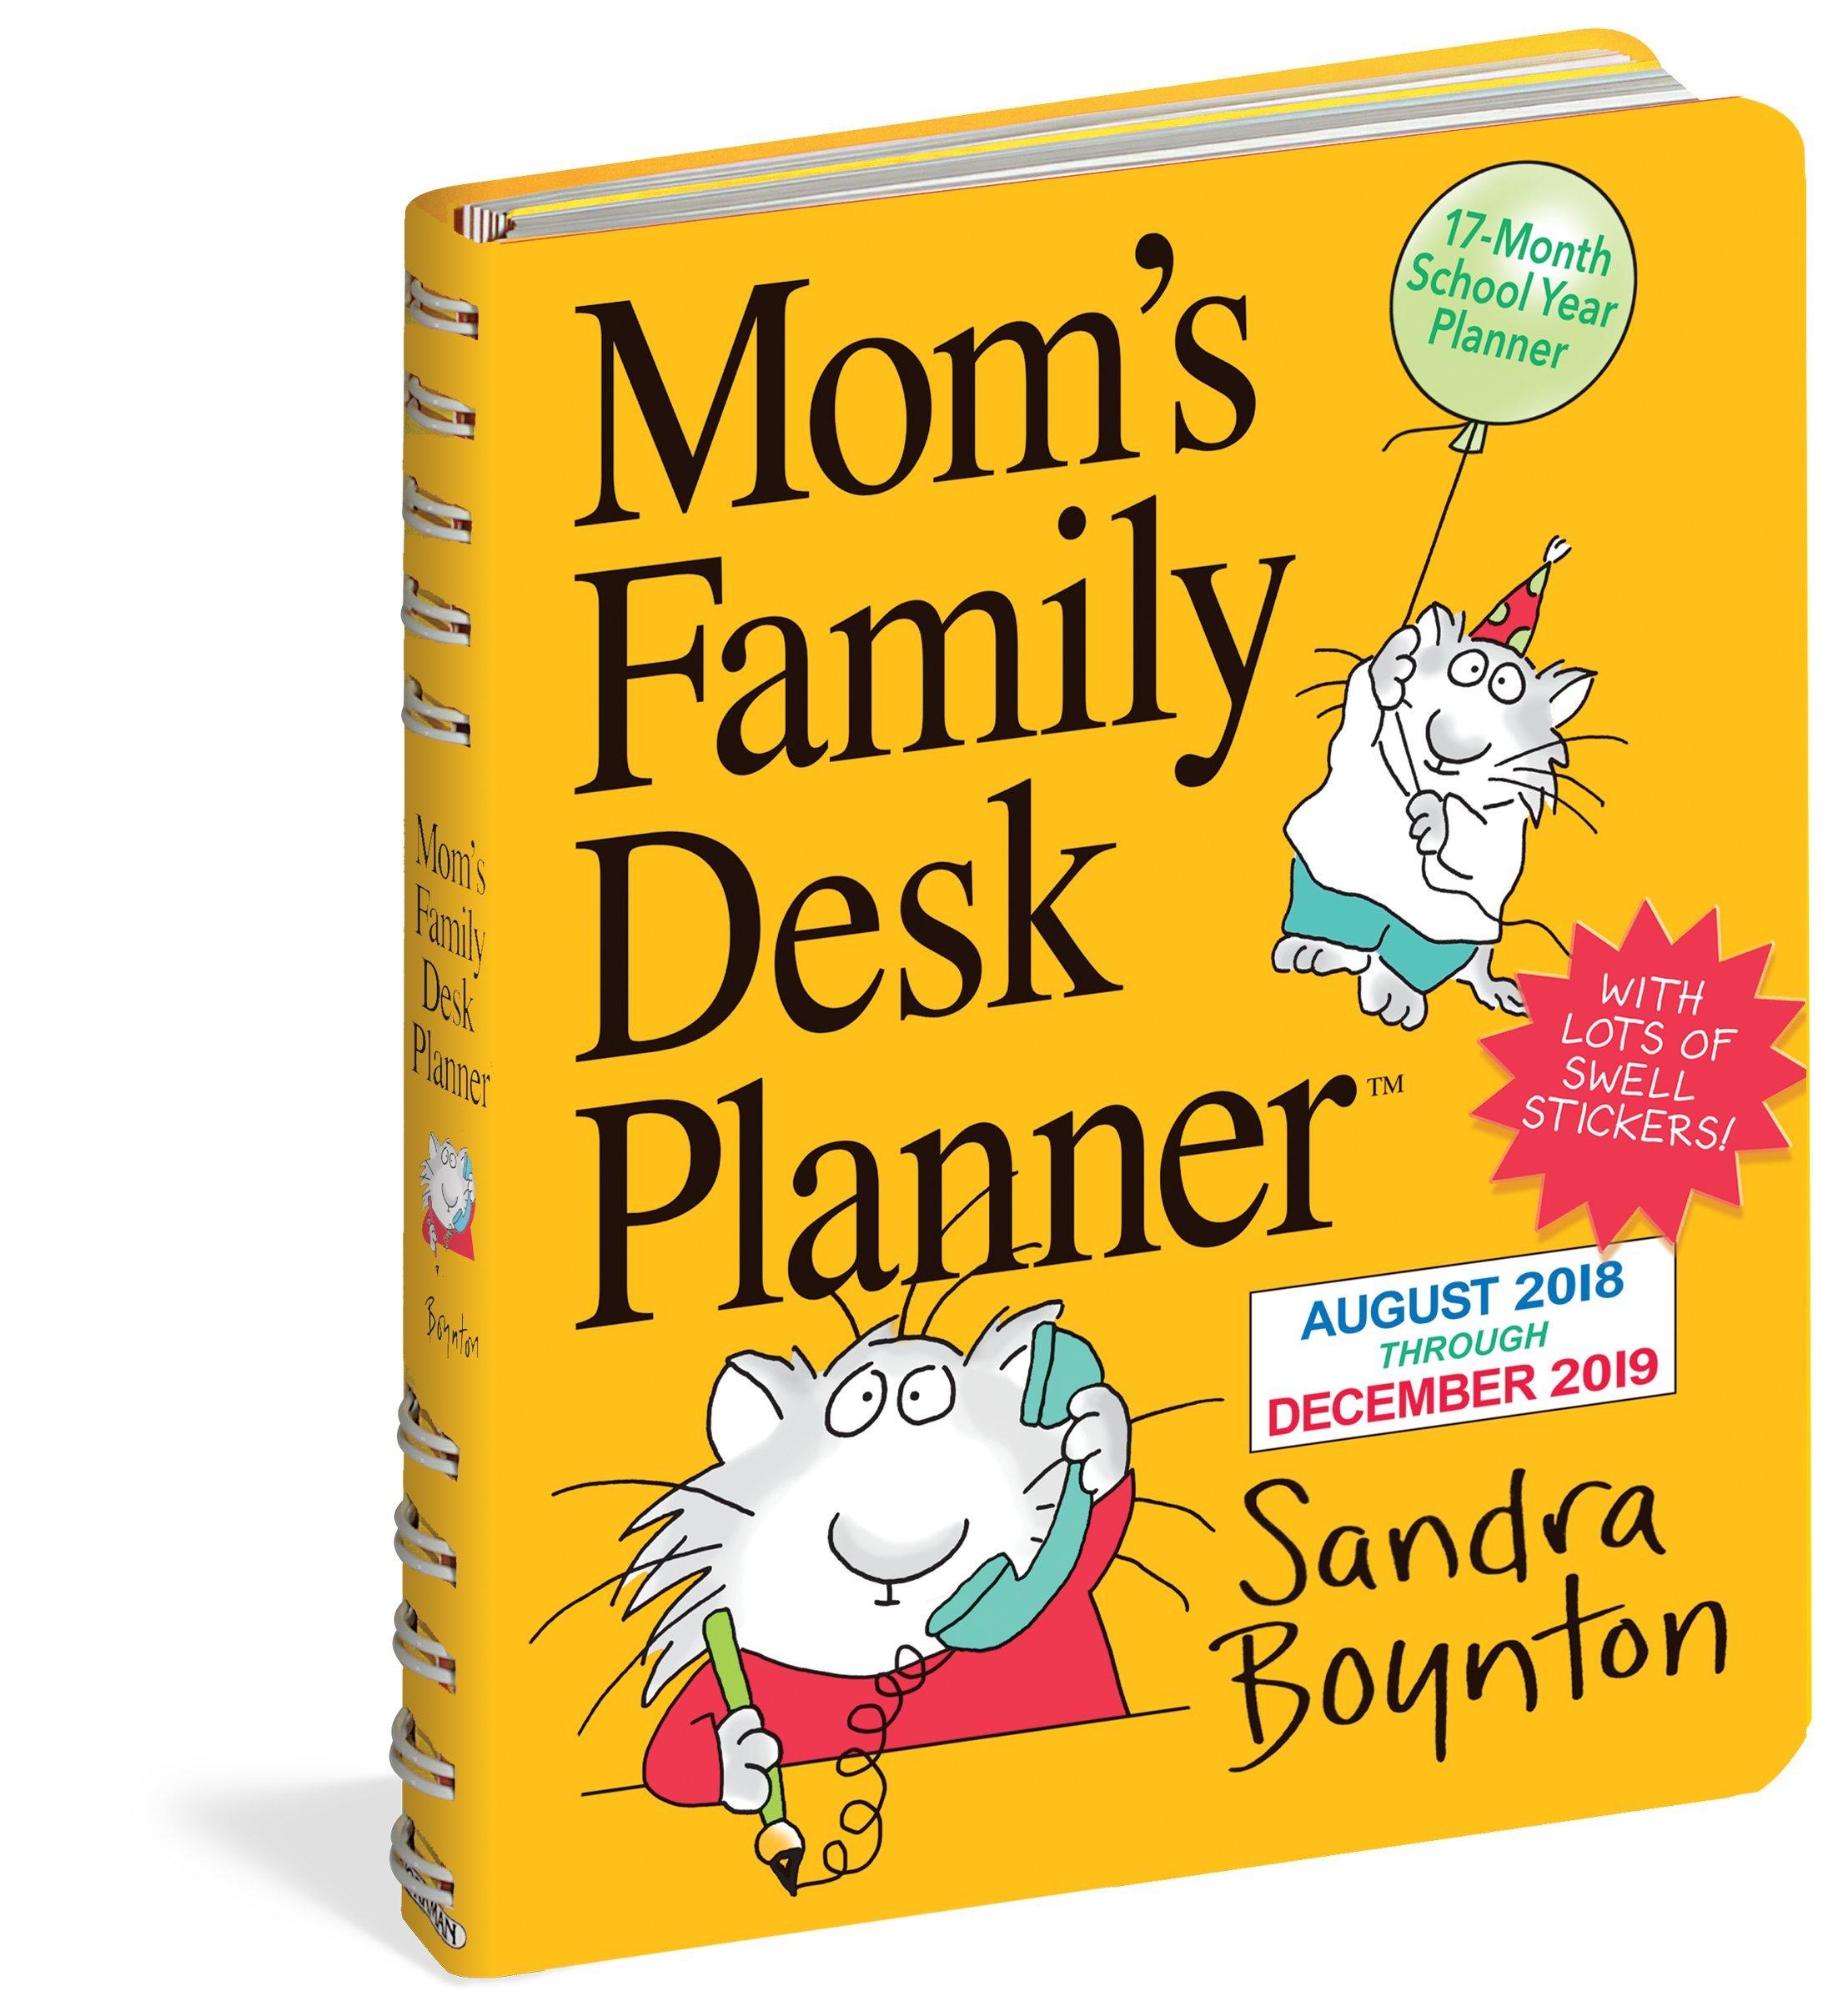 moms family desk planner calendar 2019 sandra boynton 9781523503148 amazoncom books